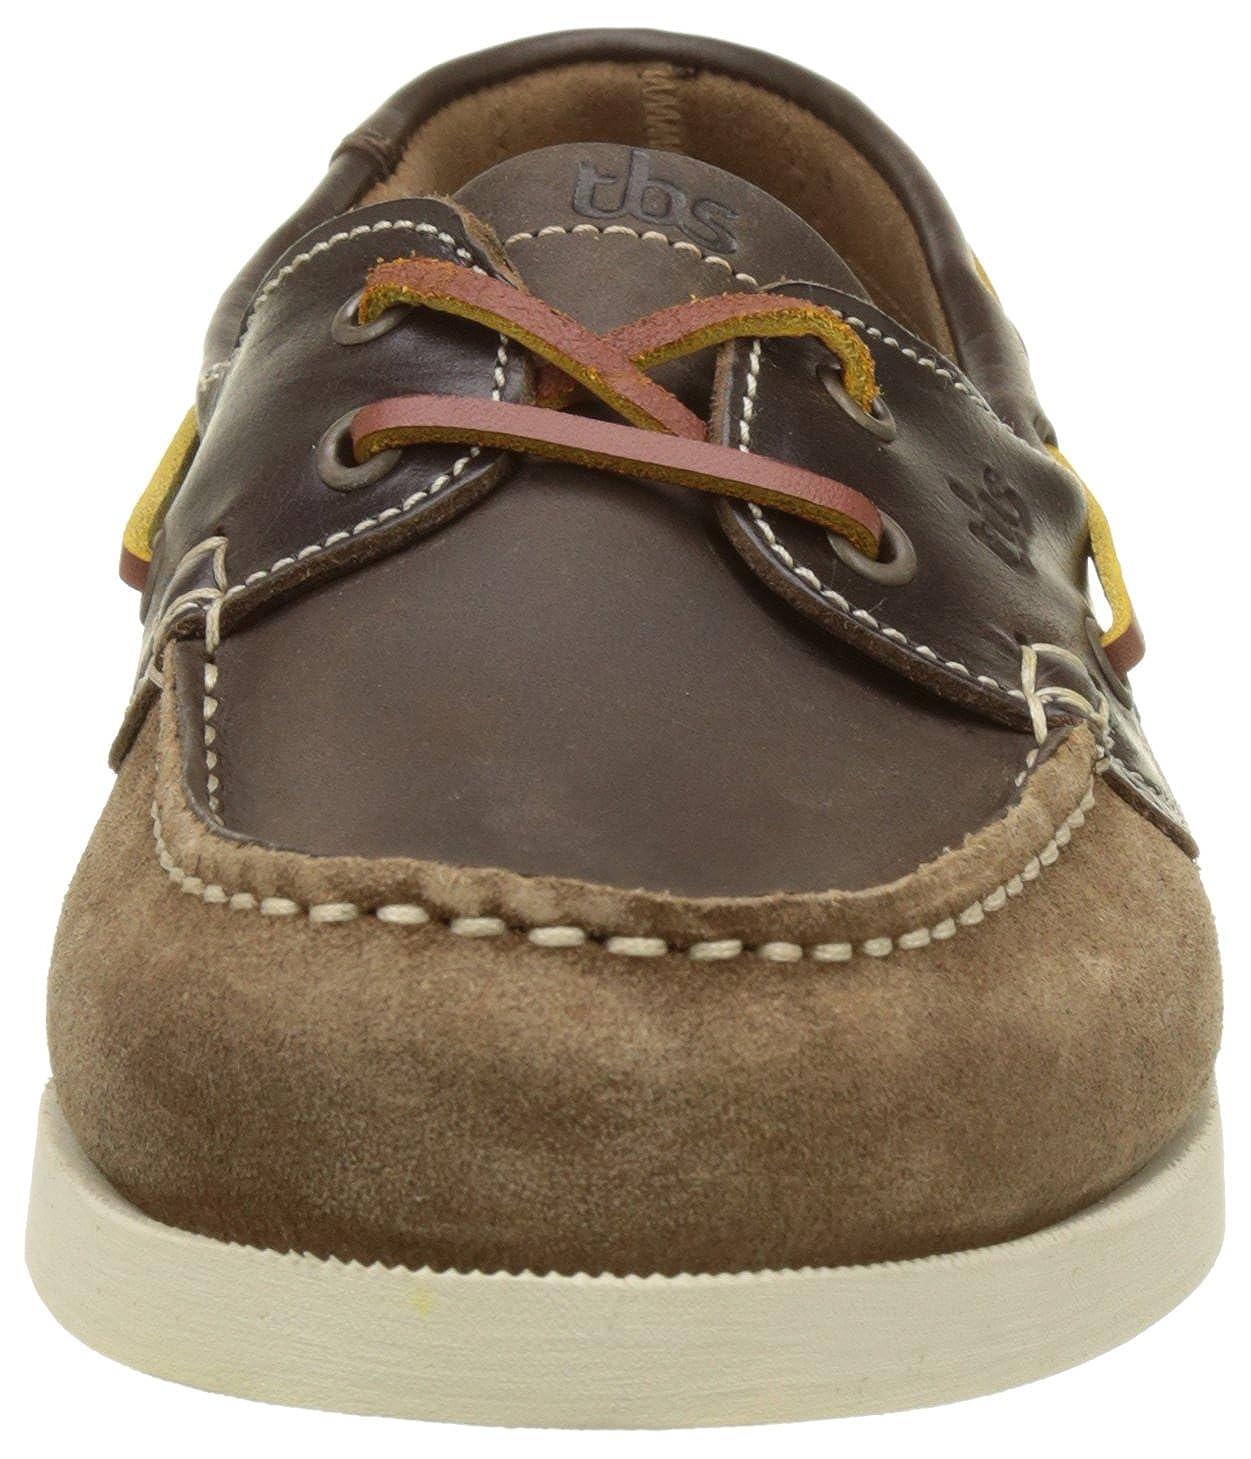 a45c9c8c49bdb9 TBS Phenis H8 Multico Datte 44 EU TBS TECHNISYNTHESE PHENIS--H80A5 Chaussures  Bateau Homme Chaussures ...